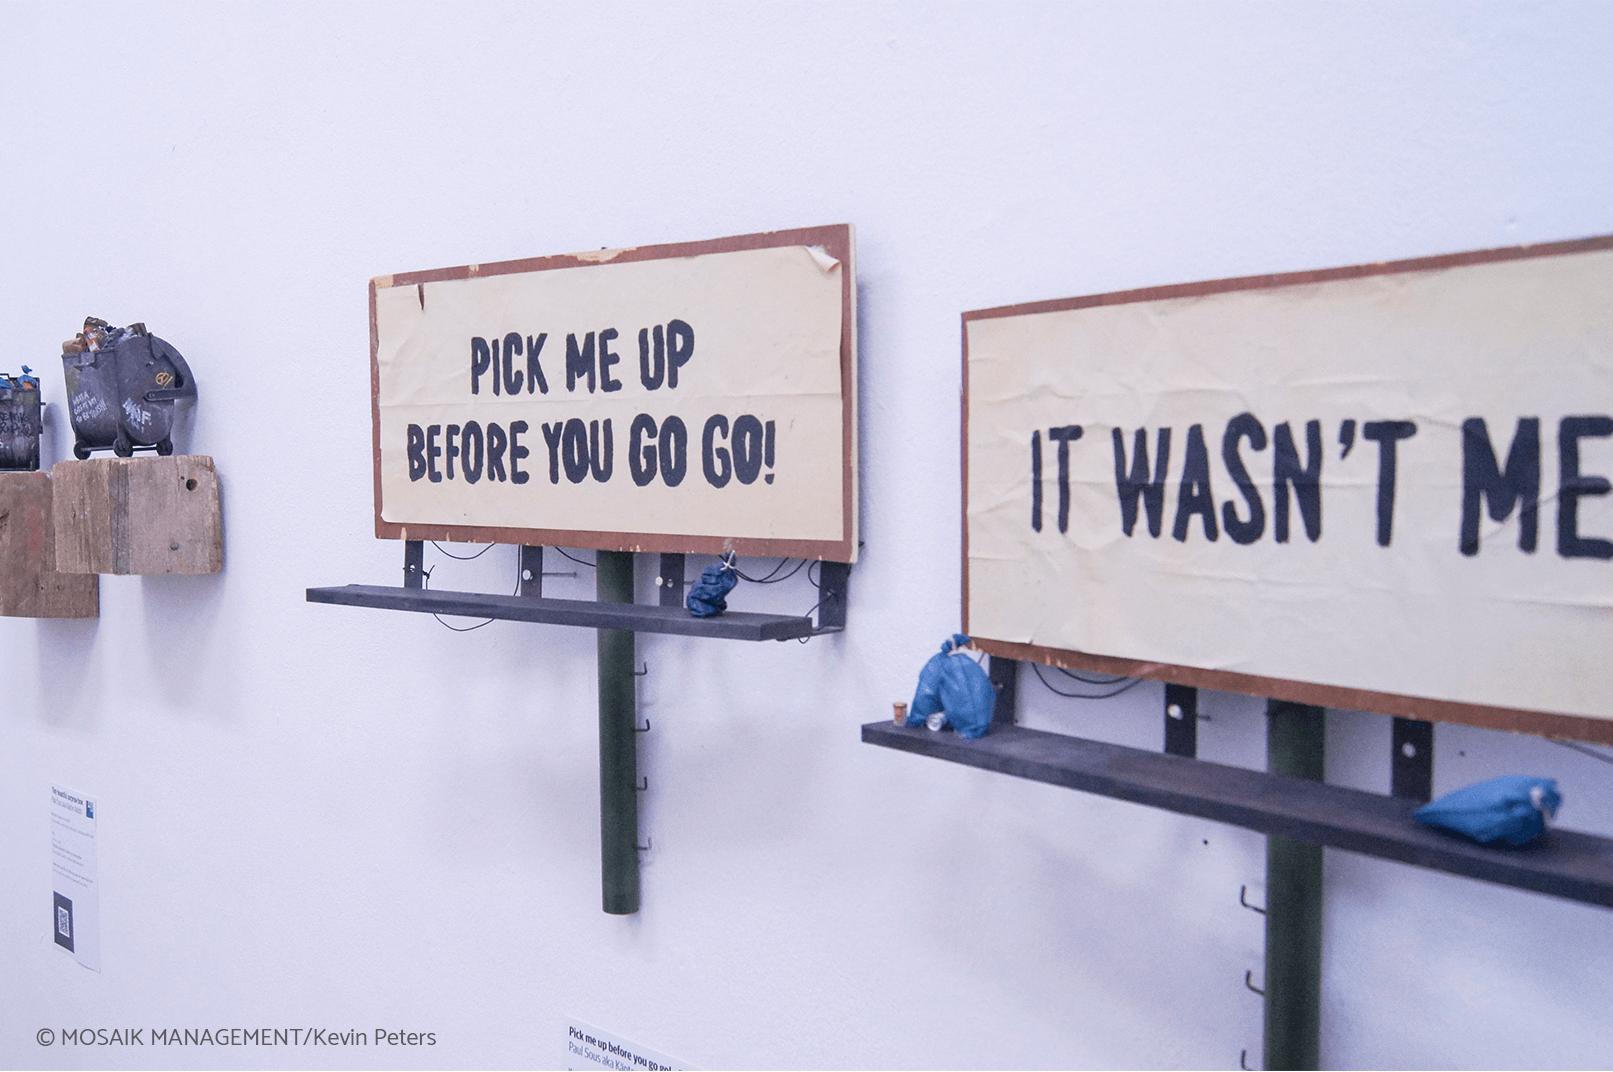 schaebens-zerowasteart-kunst-umwelt-partner-plastikmuell-interaktiv-kunstausstellung